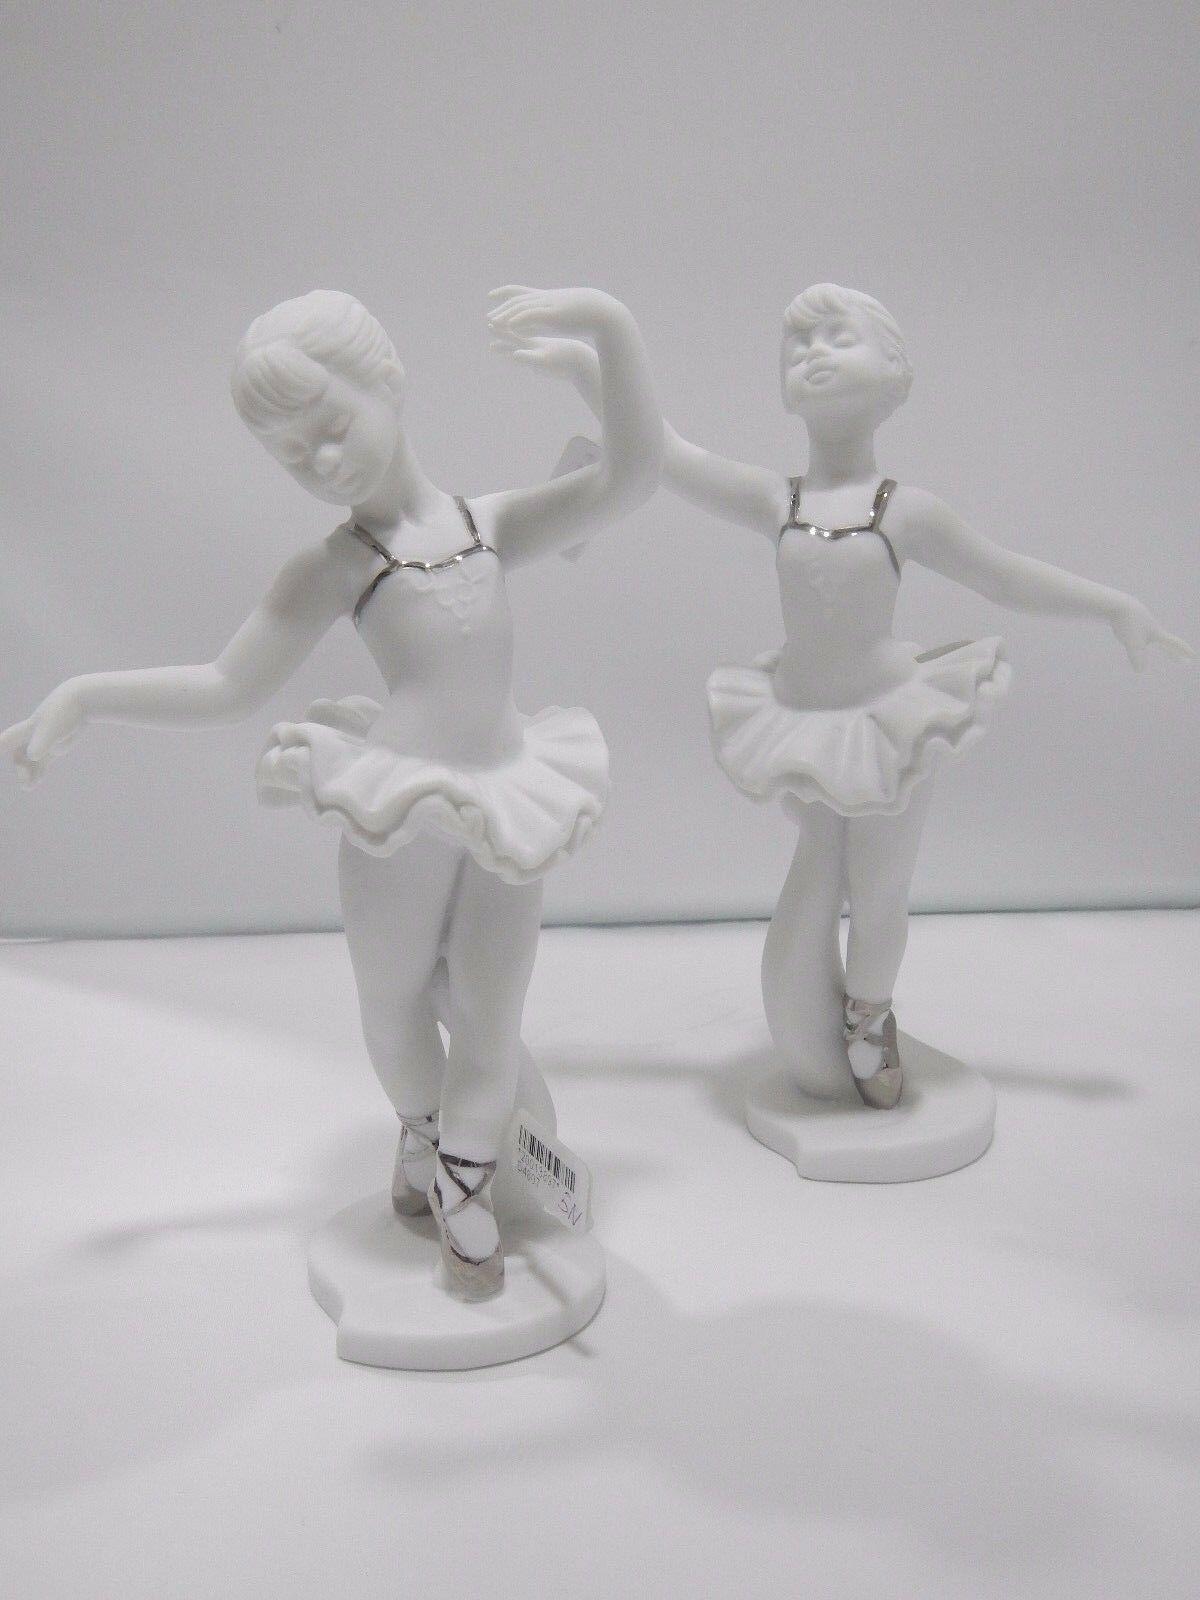 Scultura ballerina in porcellana Cuorematto D4805 D4806 D4807